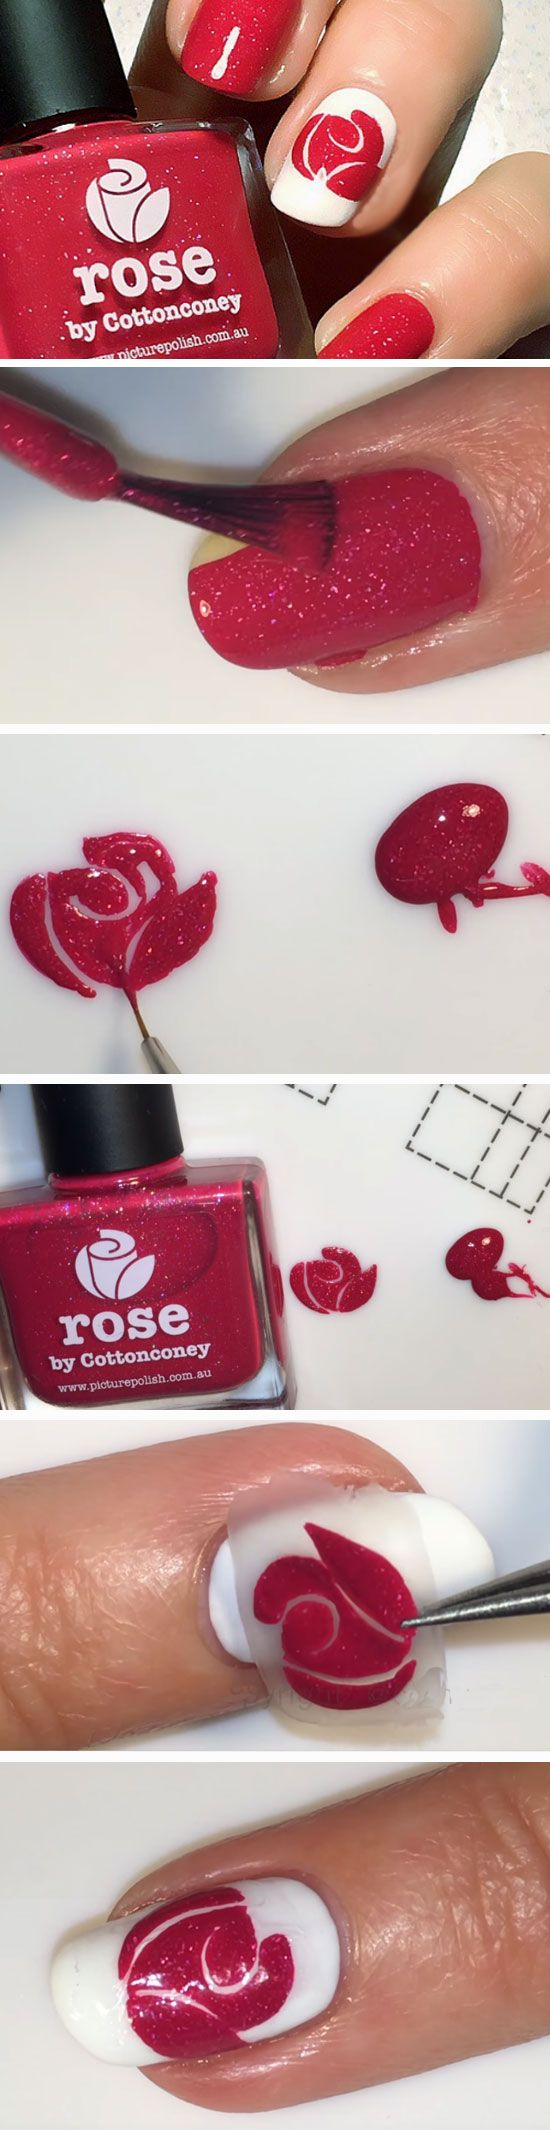 23 cute valentines day nail art ideas for teens | diy valentine